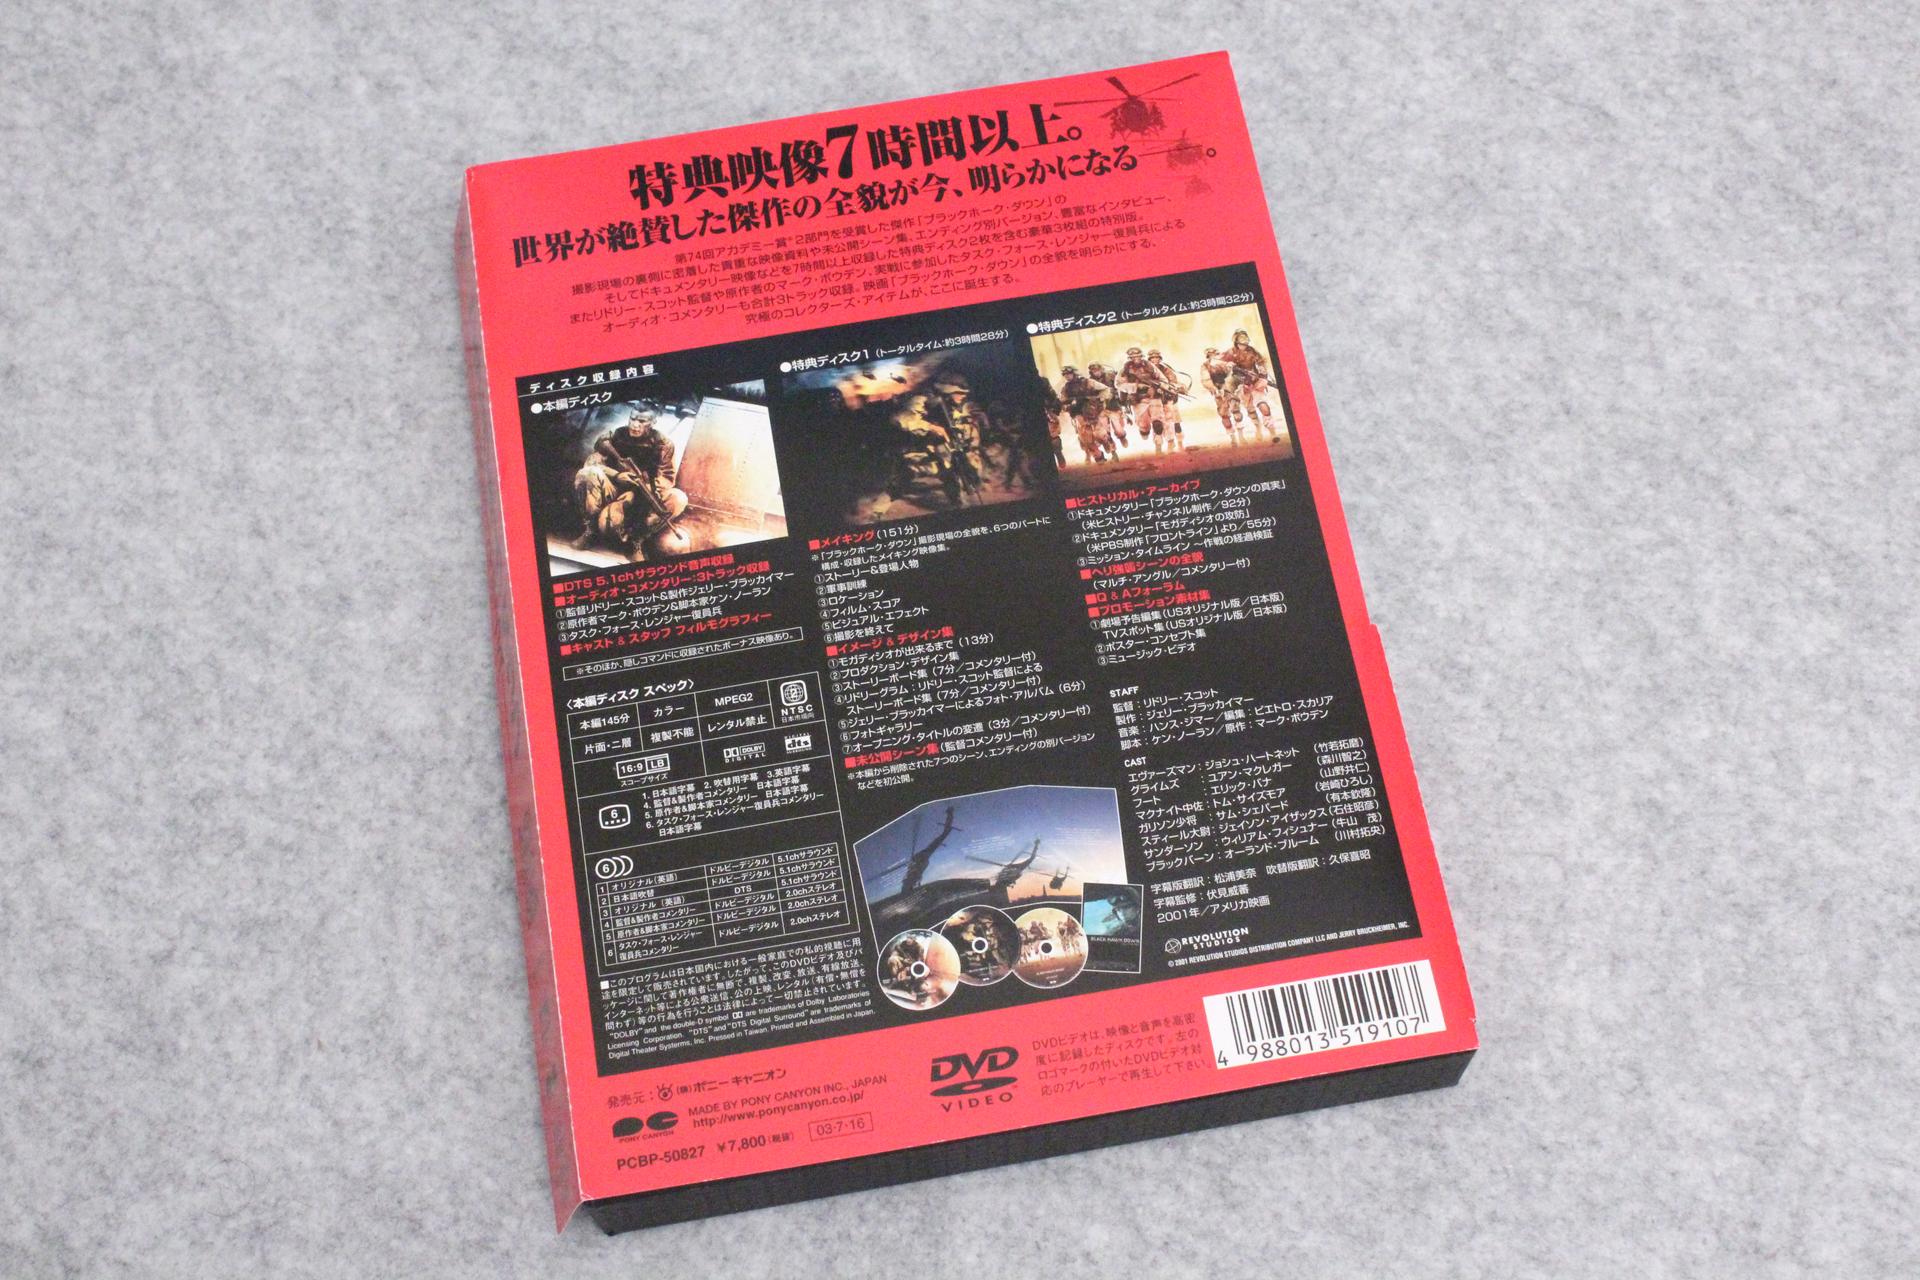 2019-12-09-BLACKHAWKDOWN-DVD_CE-02.JPG